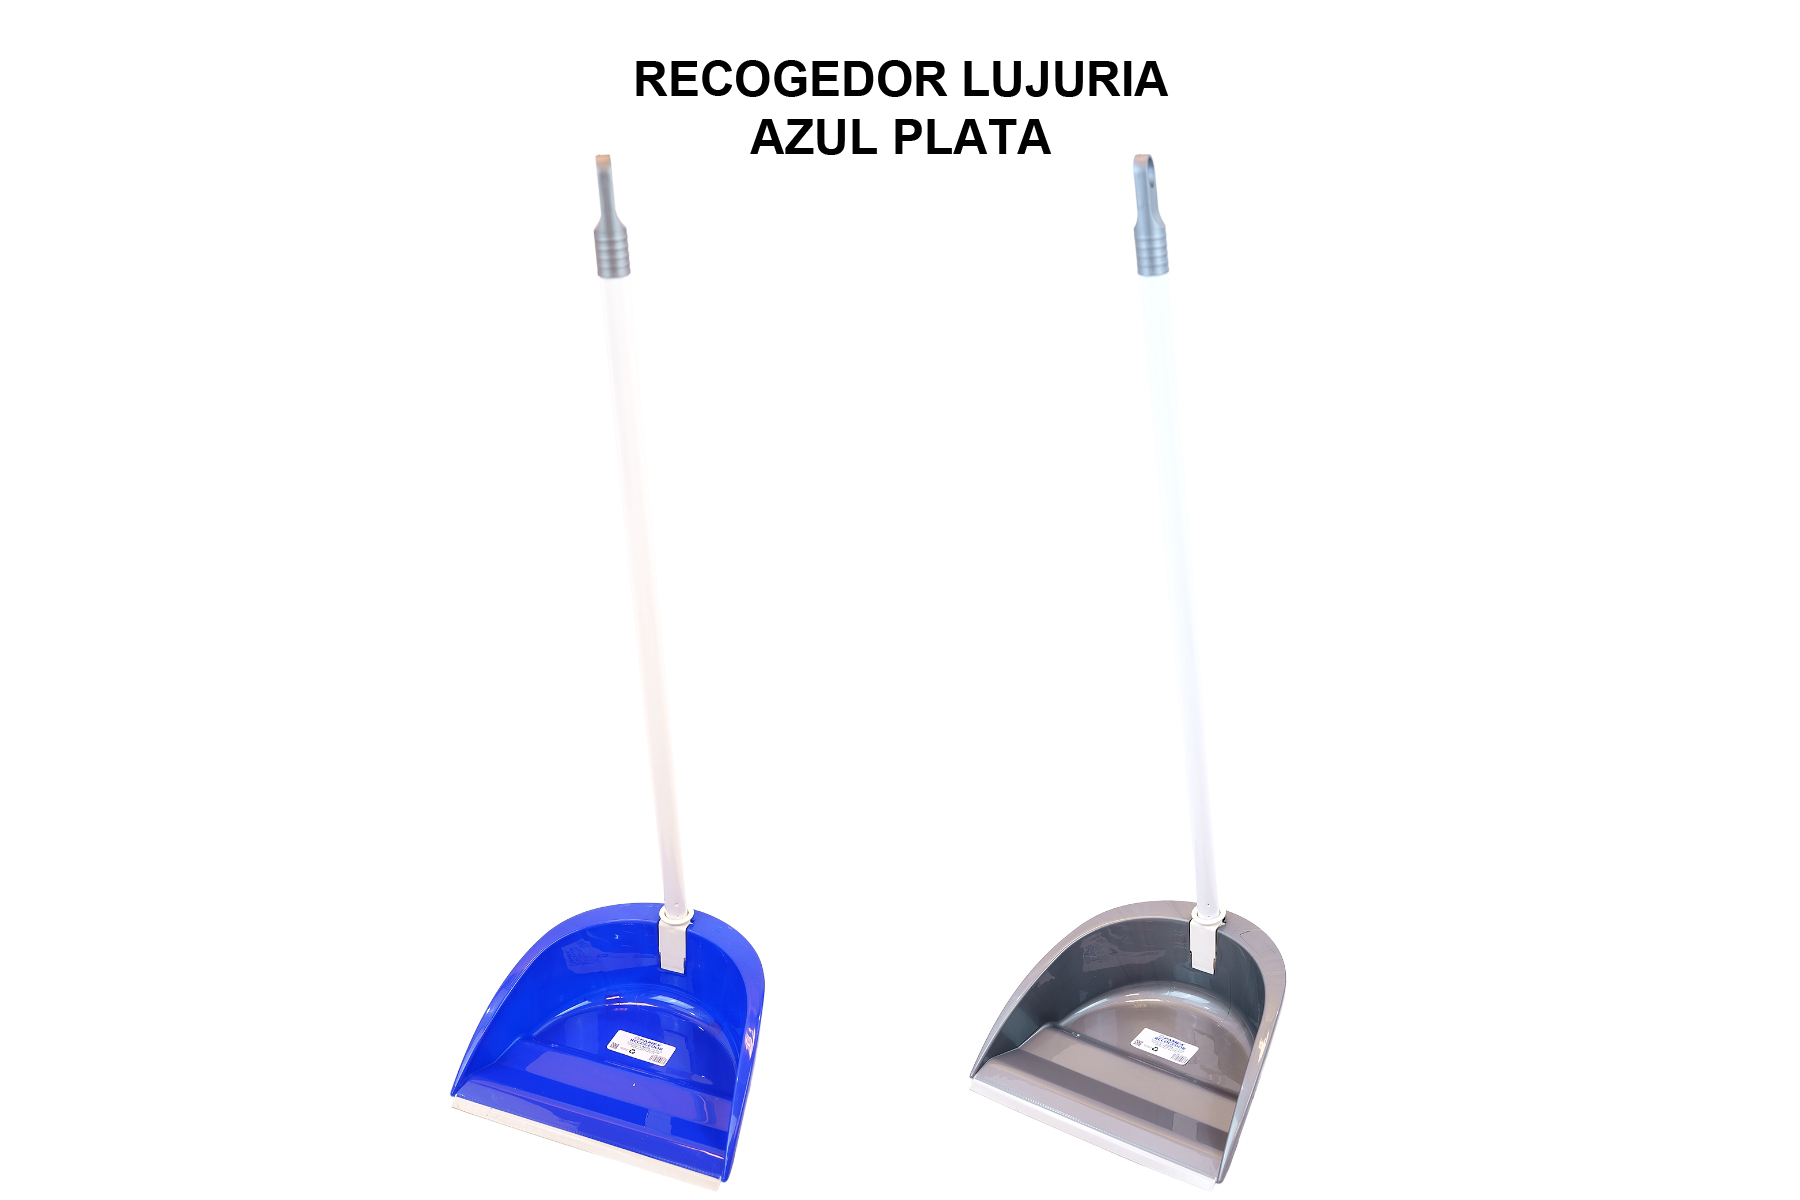 RECOGEDOR LUJURIA AZUL PLATA